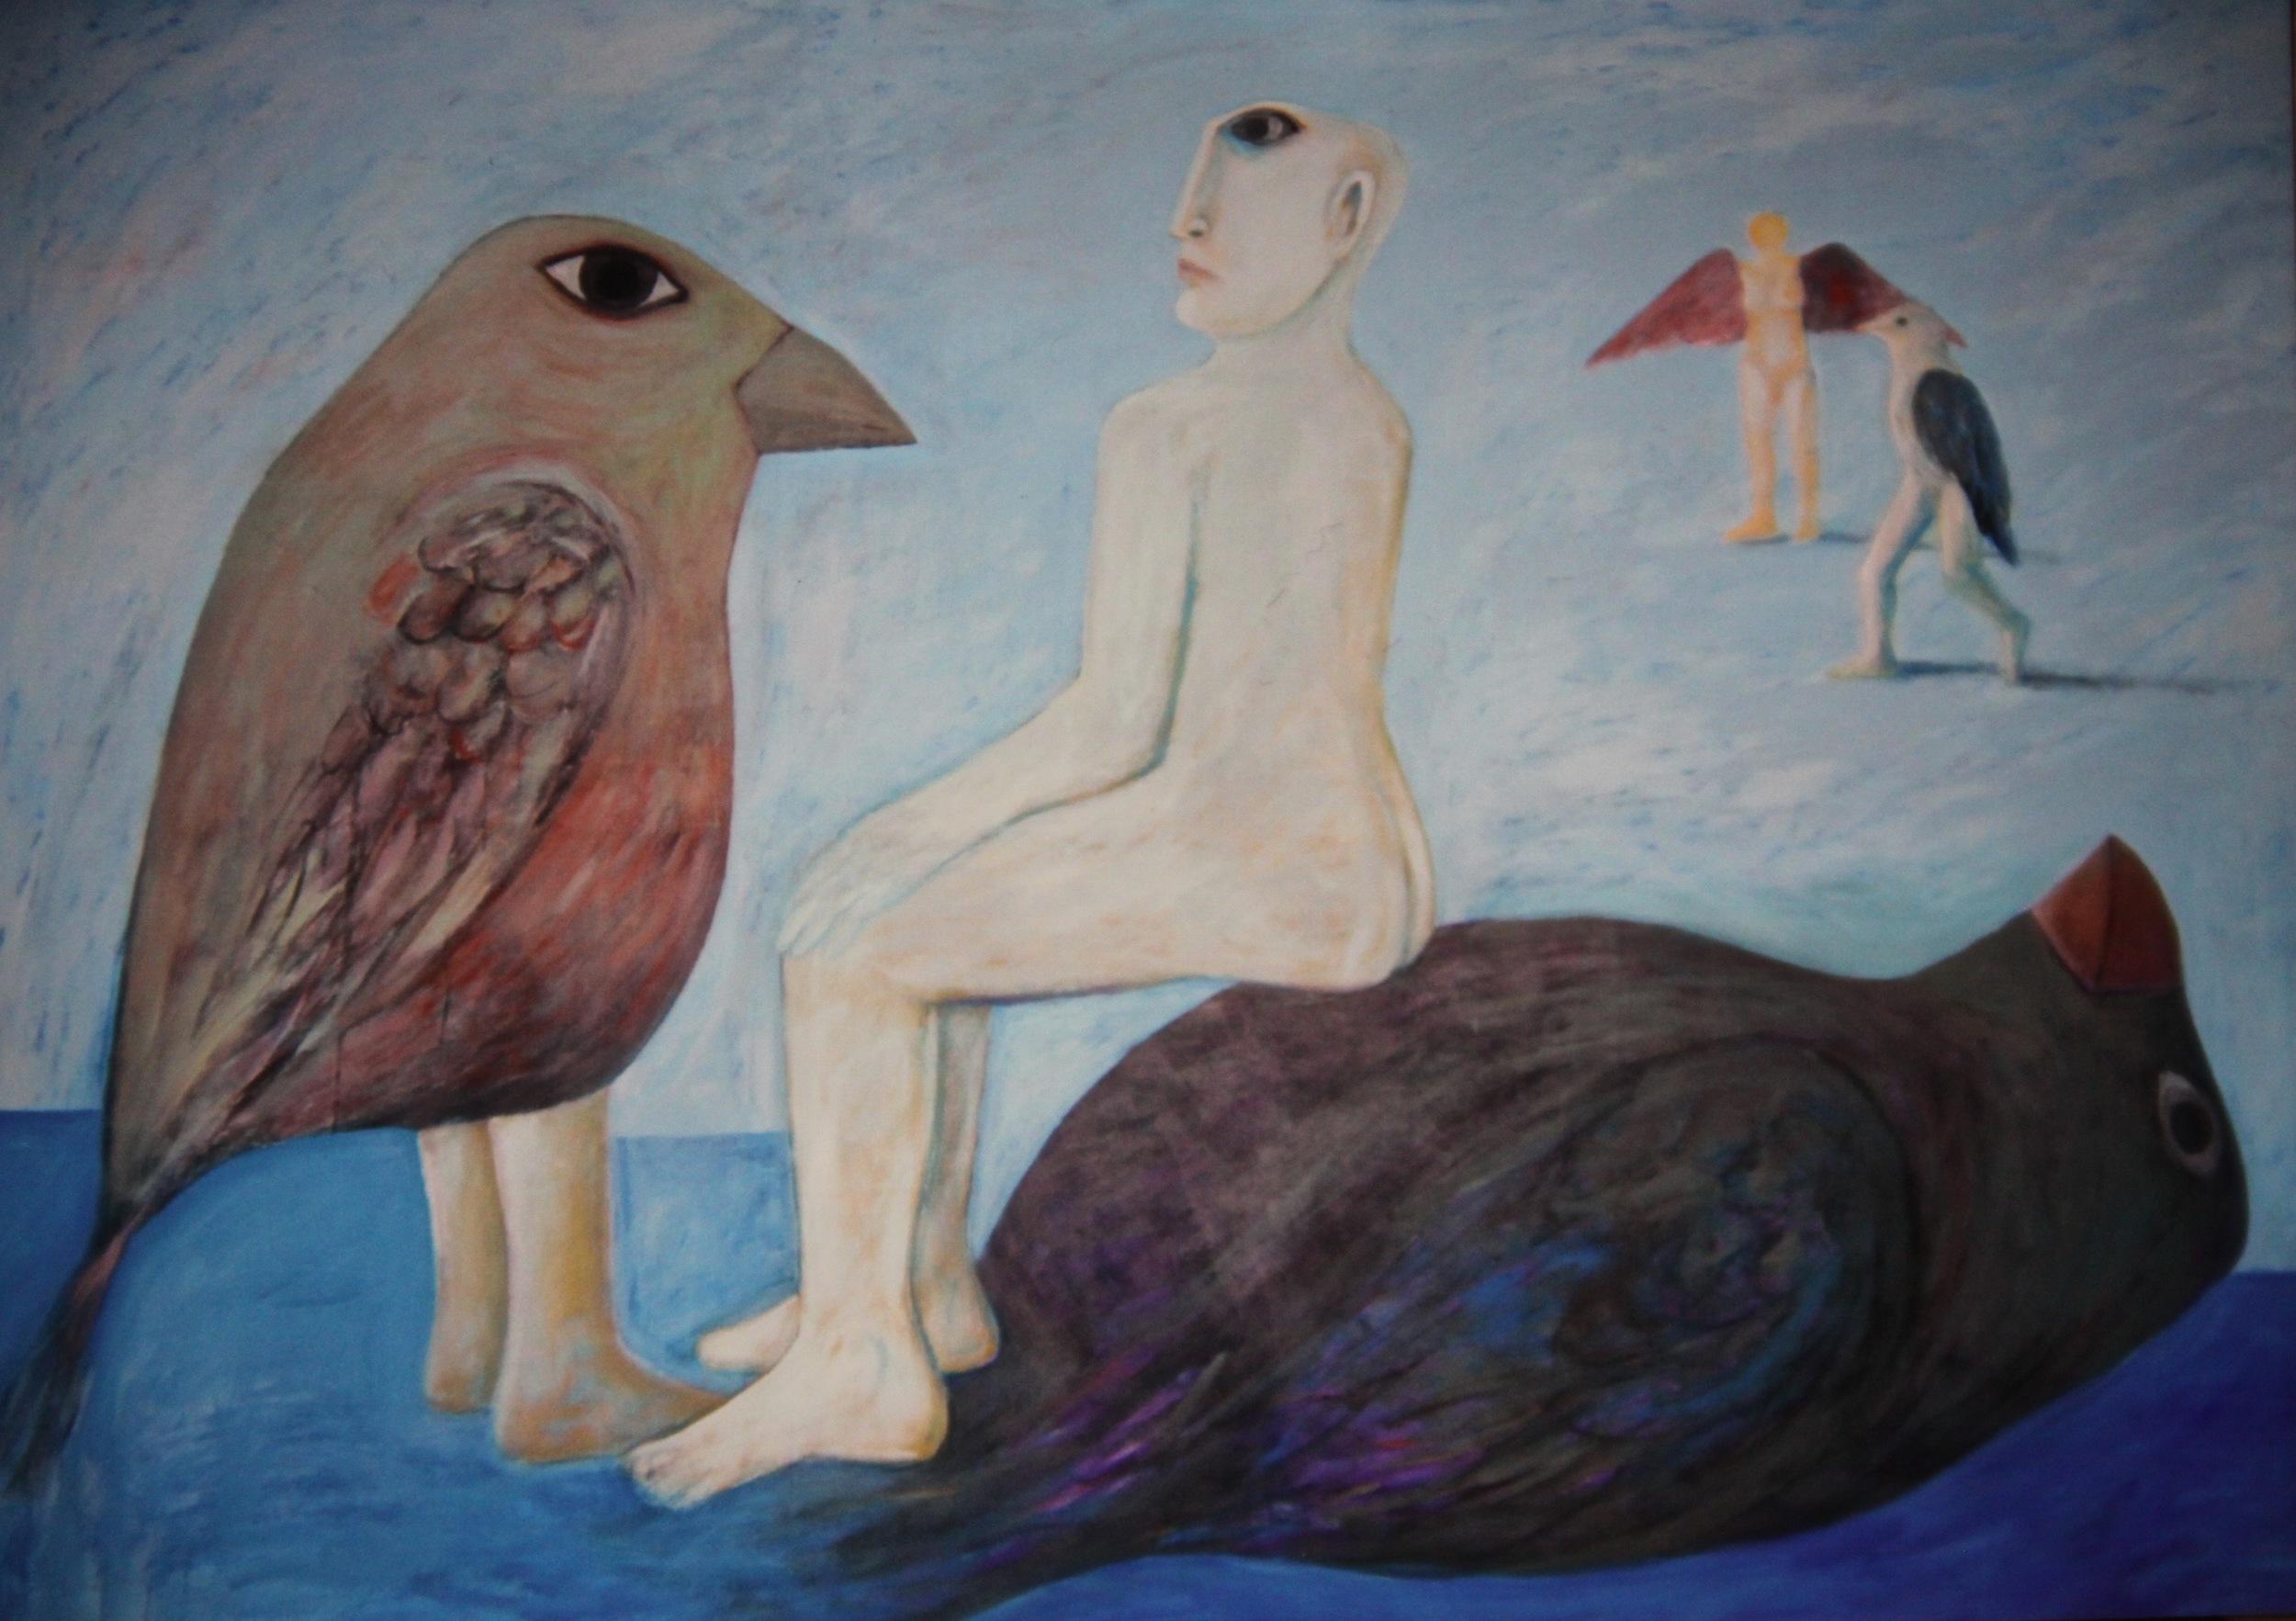 Ahmed_Morsi_The_Black_Bird_2007.jpg